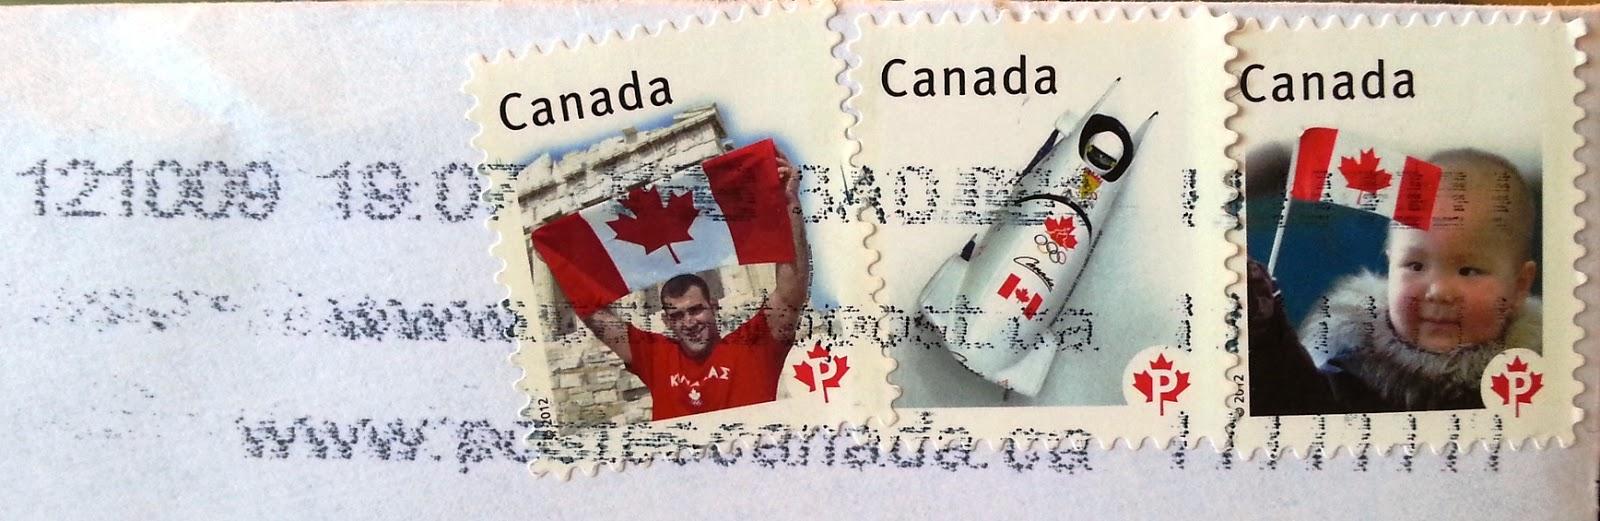 francobolli canadesi 2012